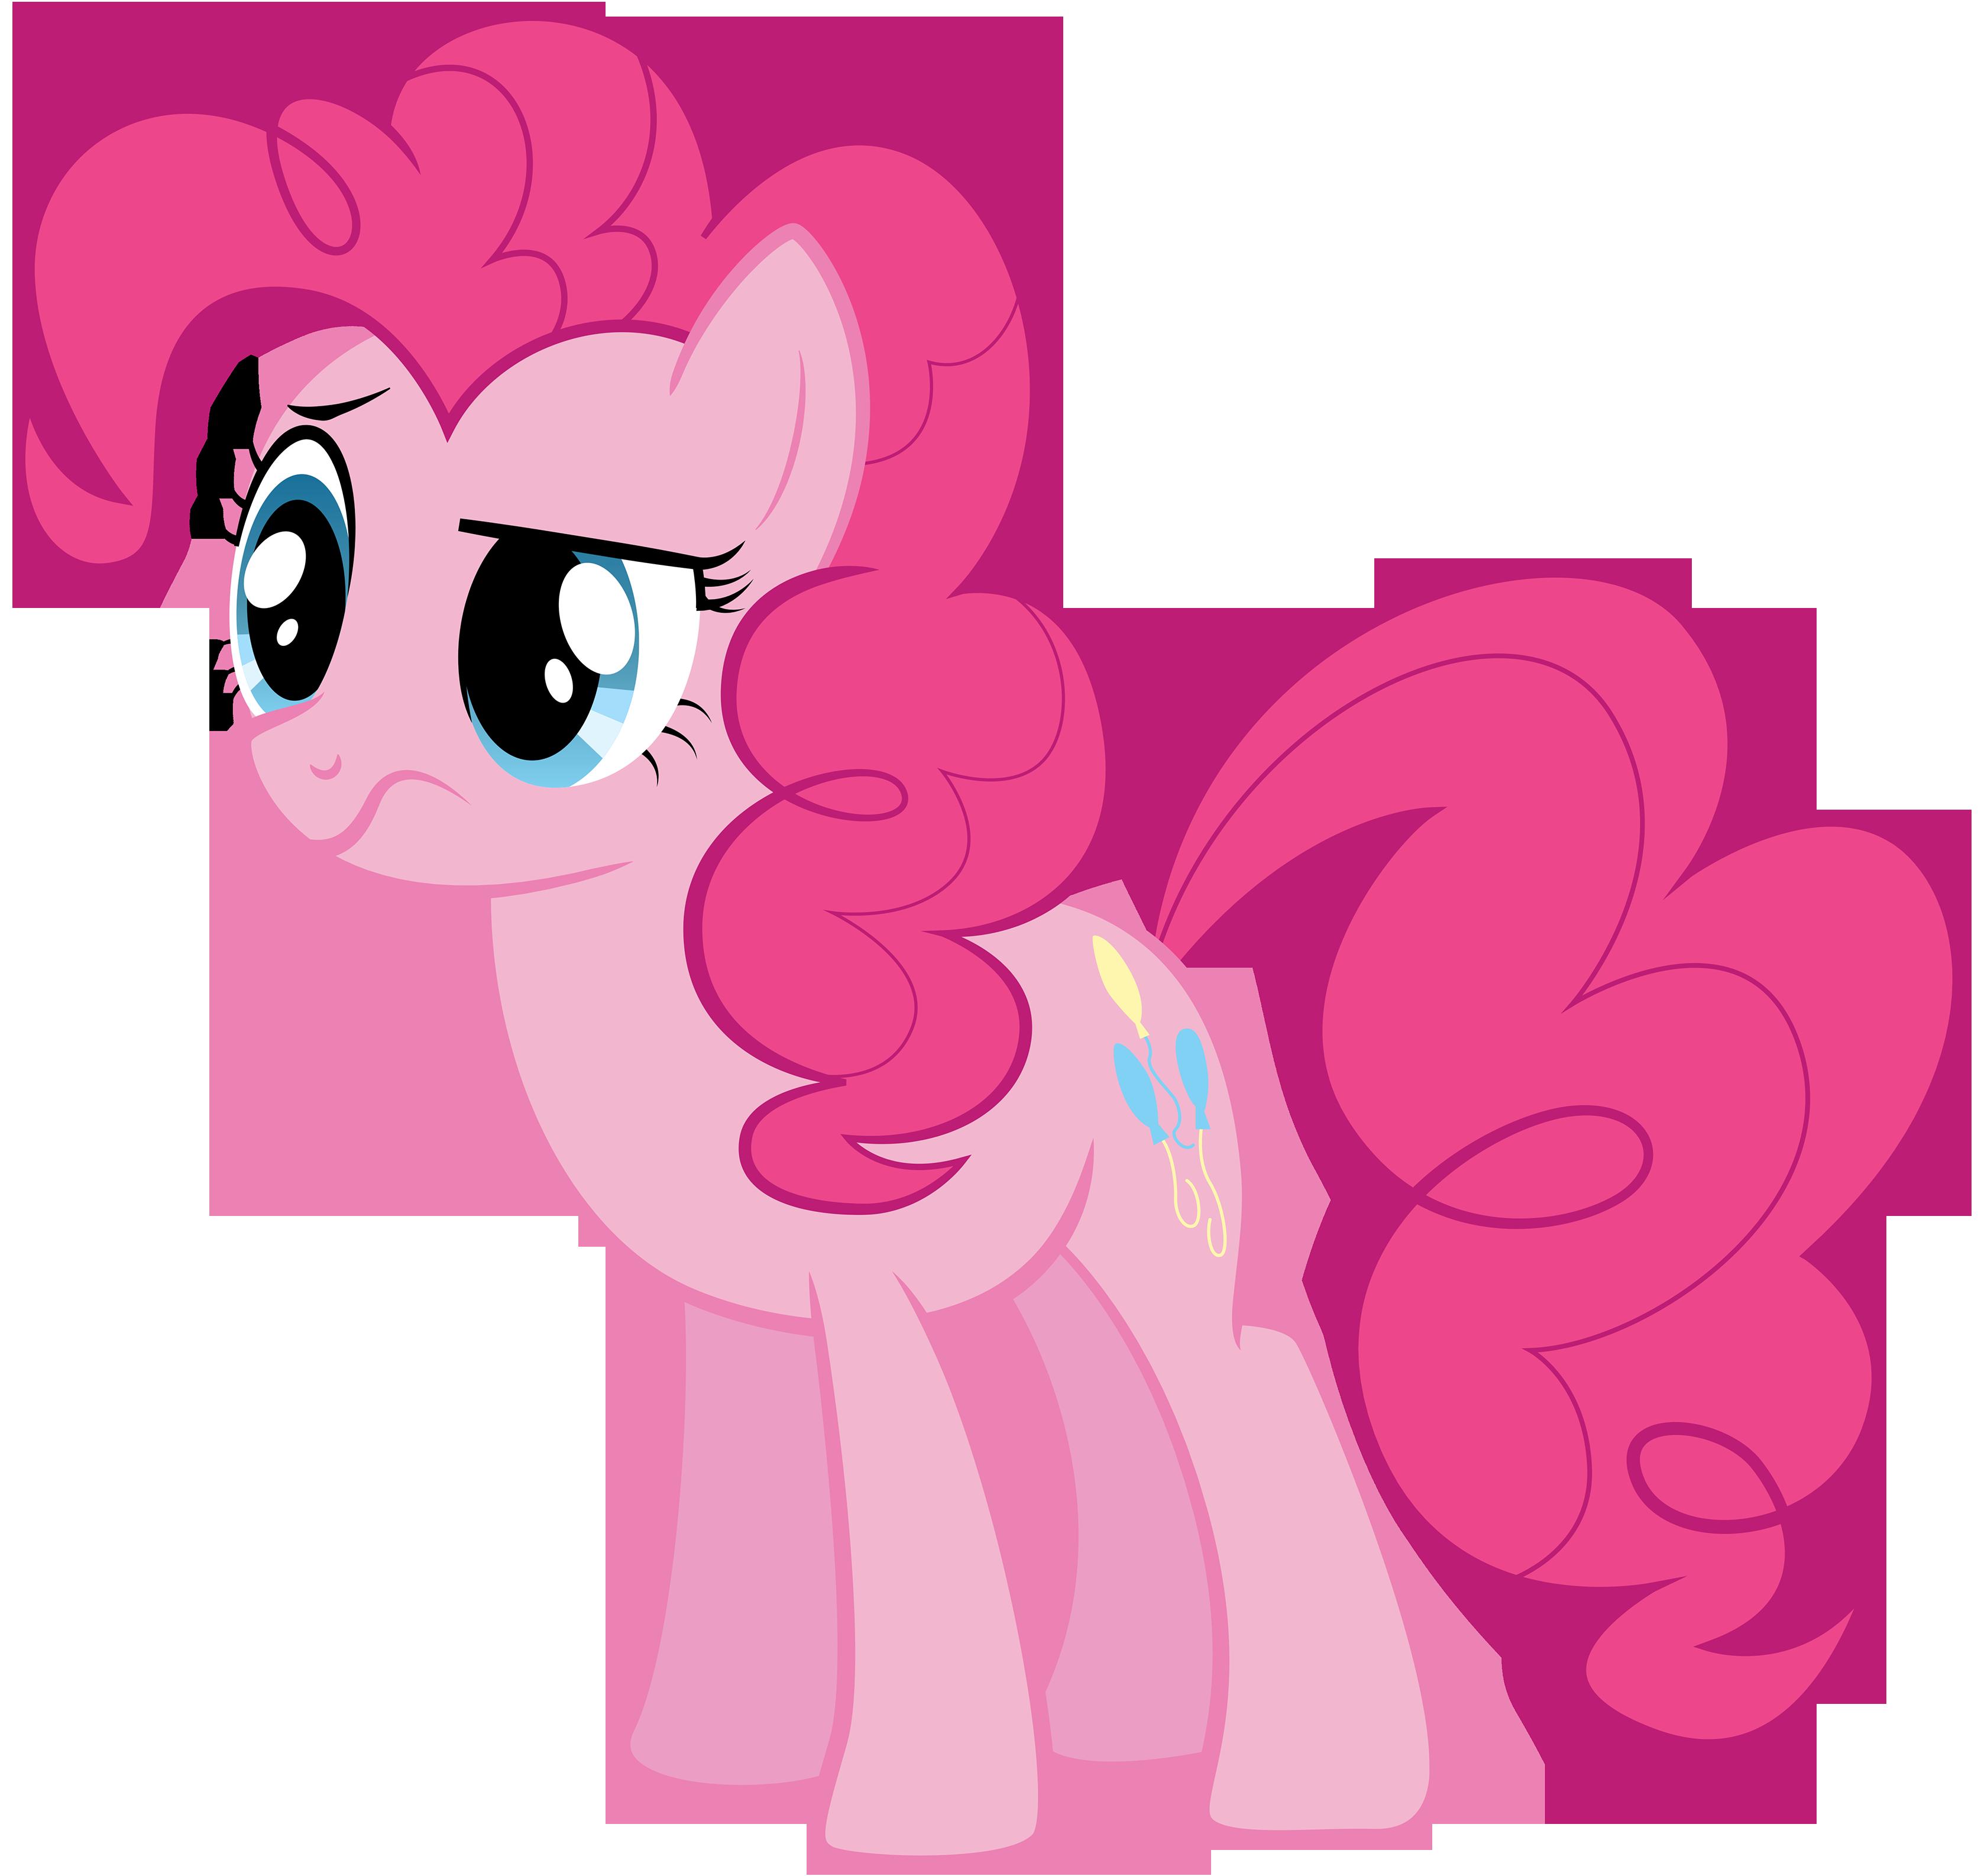 Pinkie Pie Is Confused By Spellboundcanvas Pinkie Pie Pinkie My Little Pony Friendship